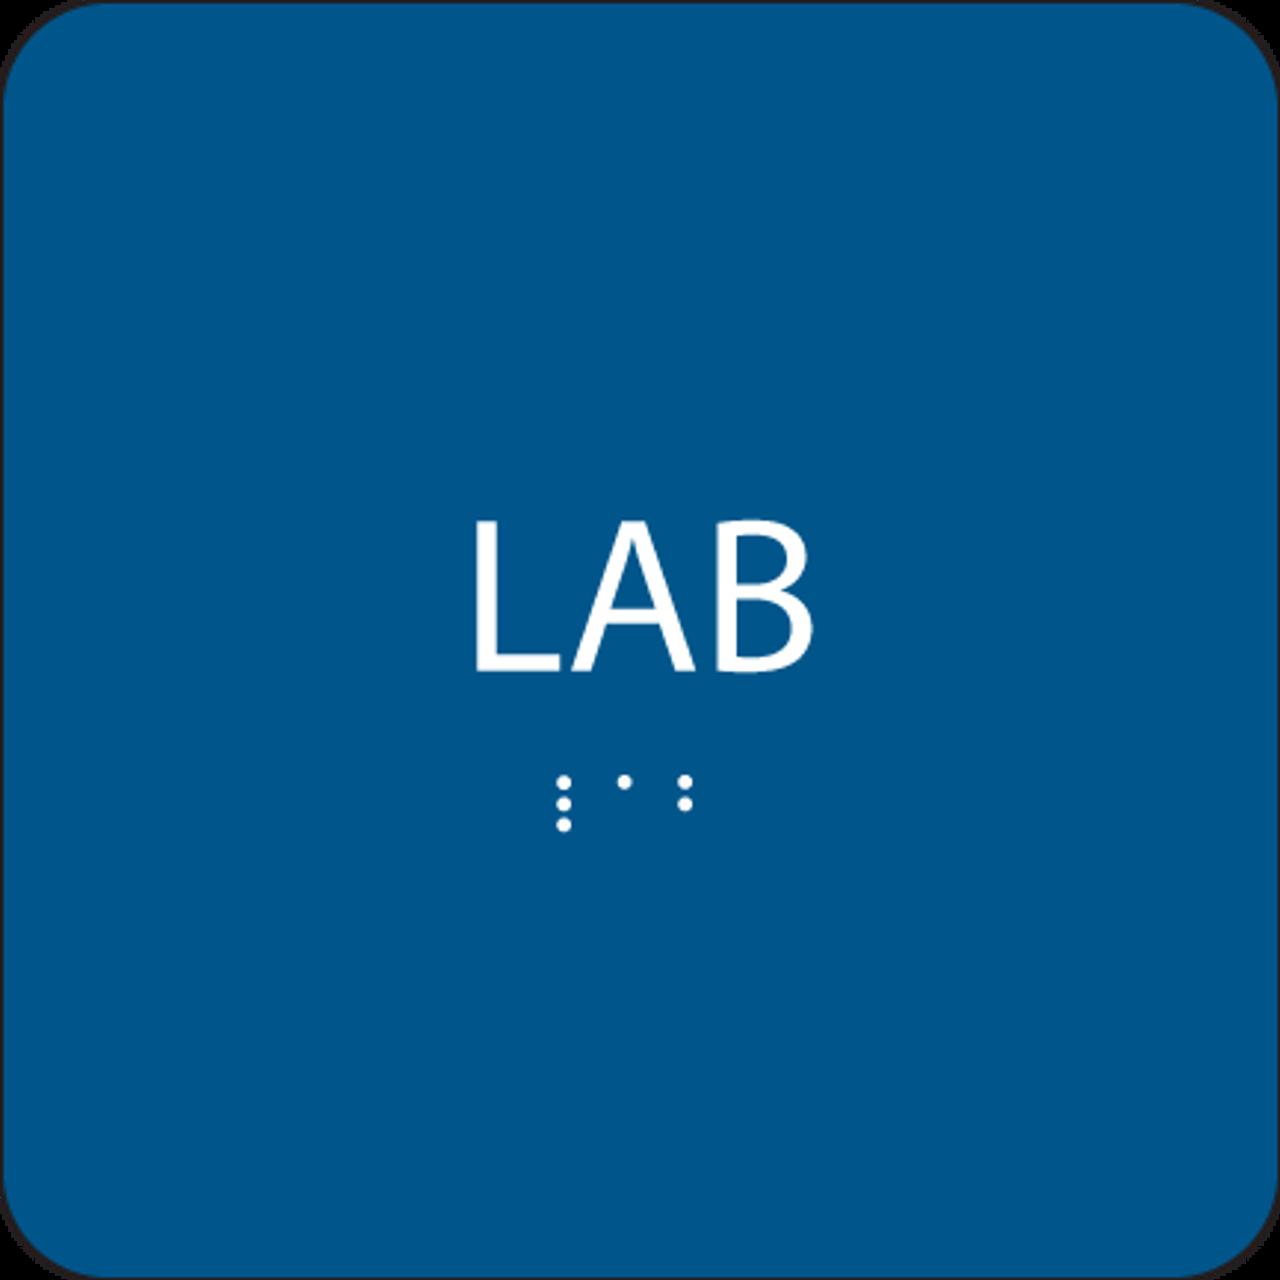 Blue Lab ADA Sign